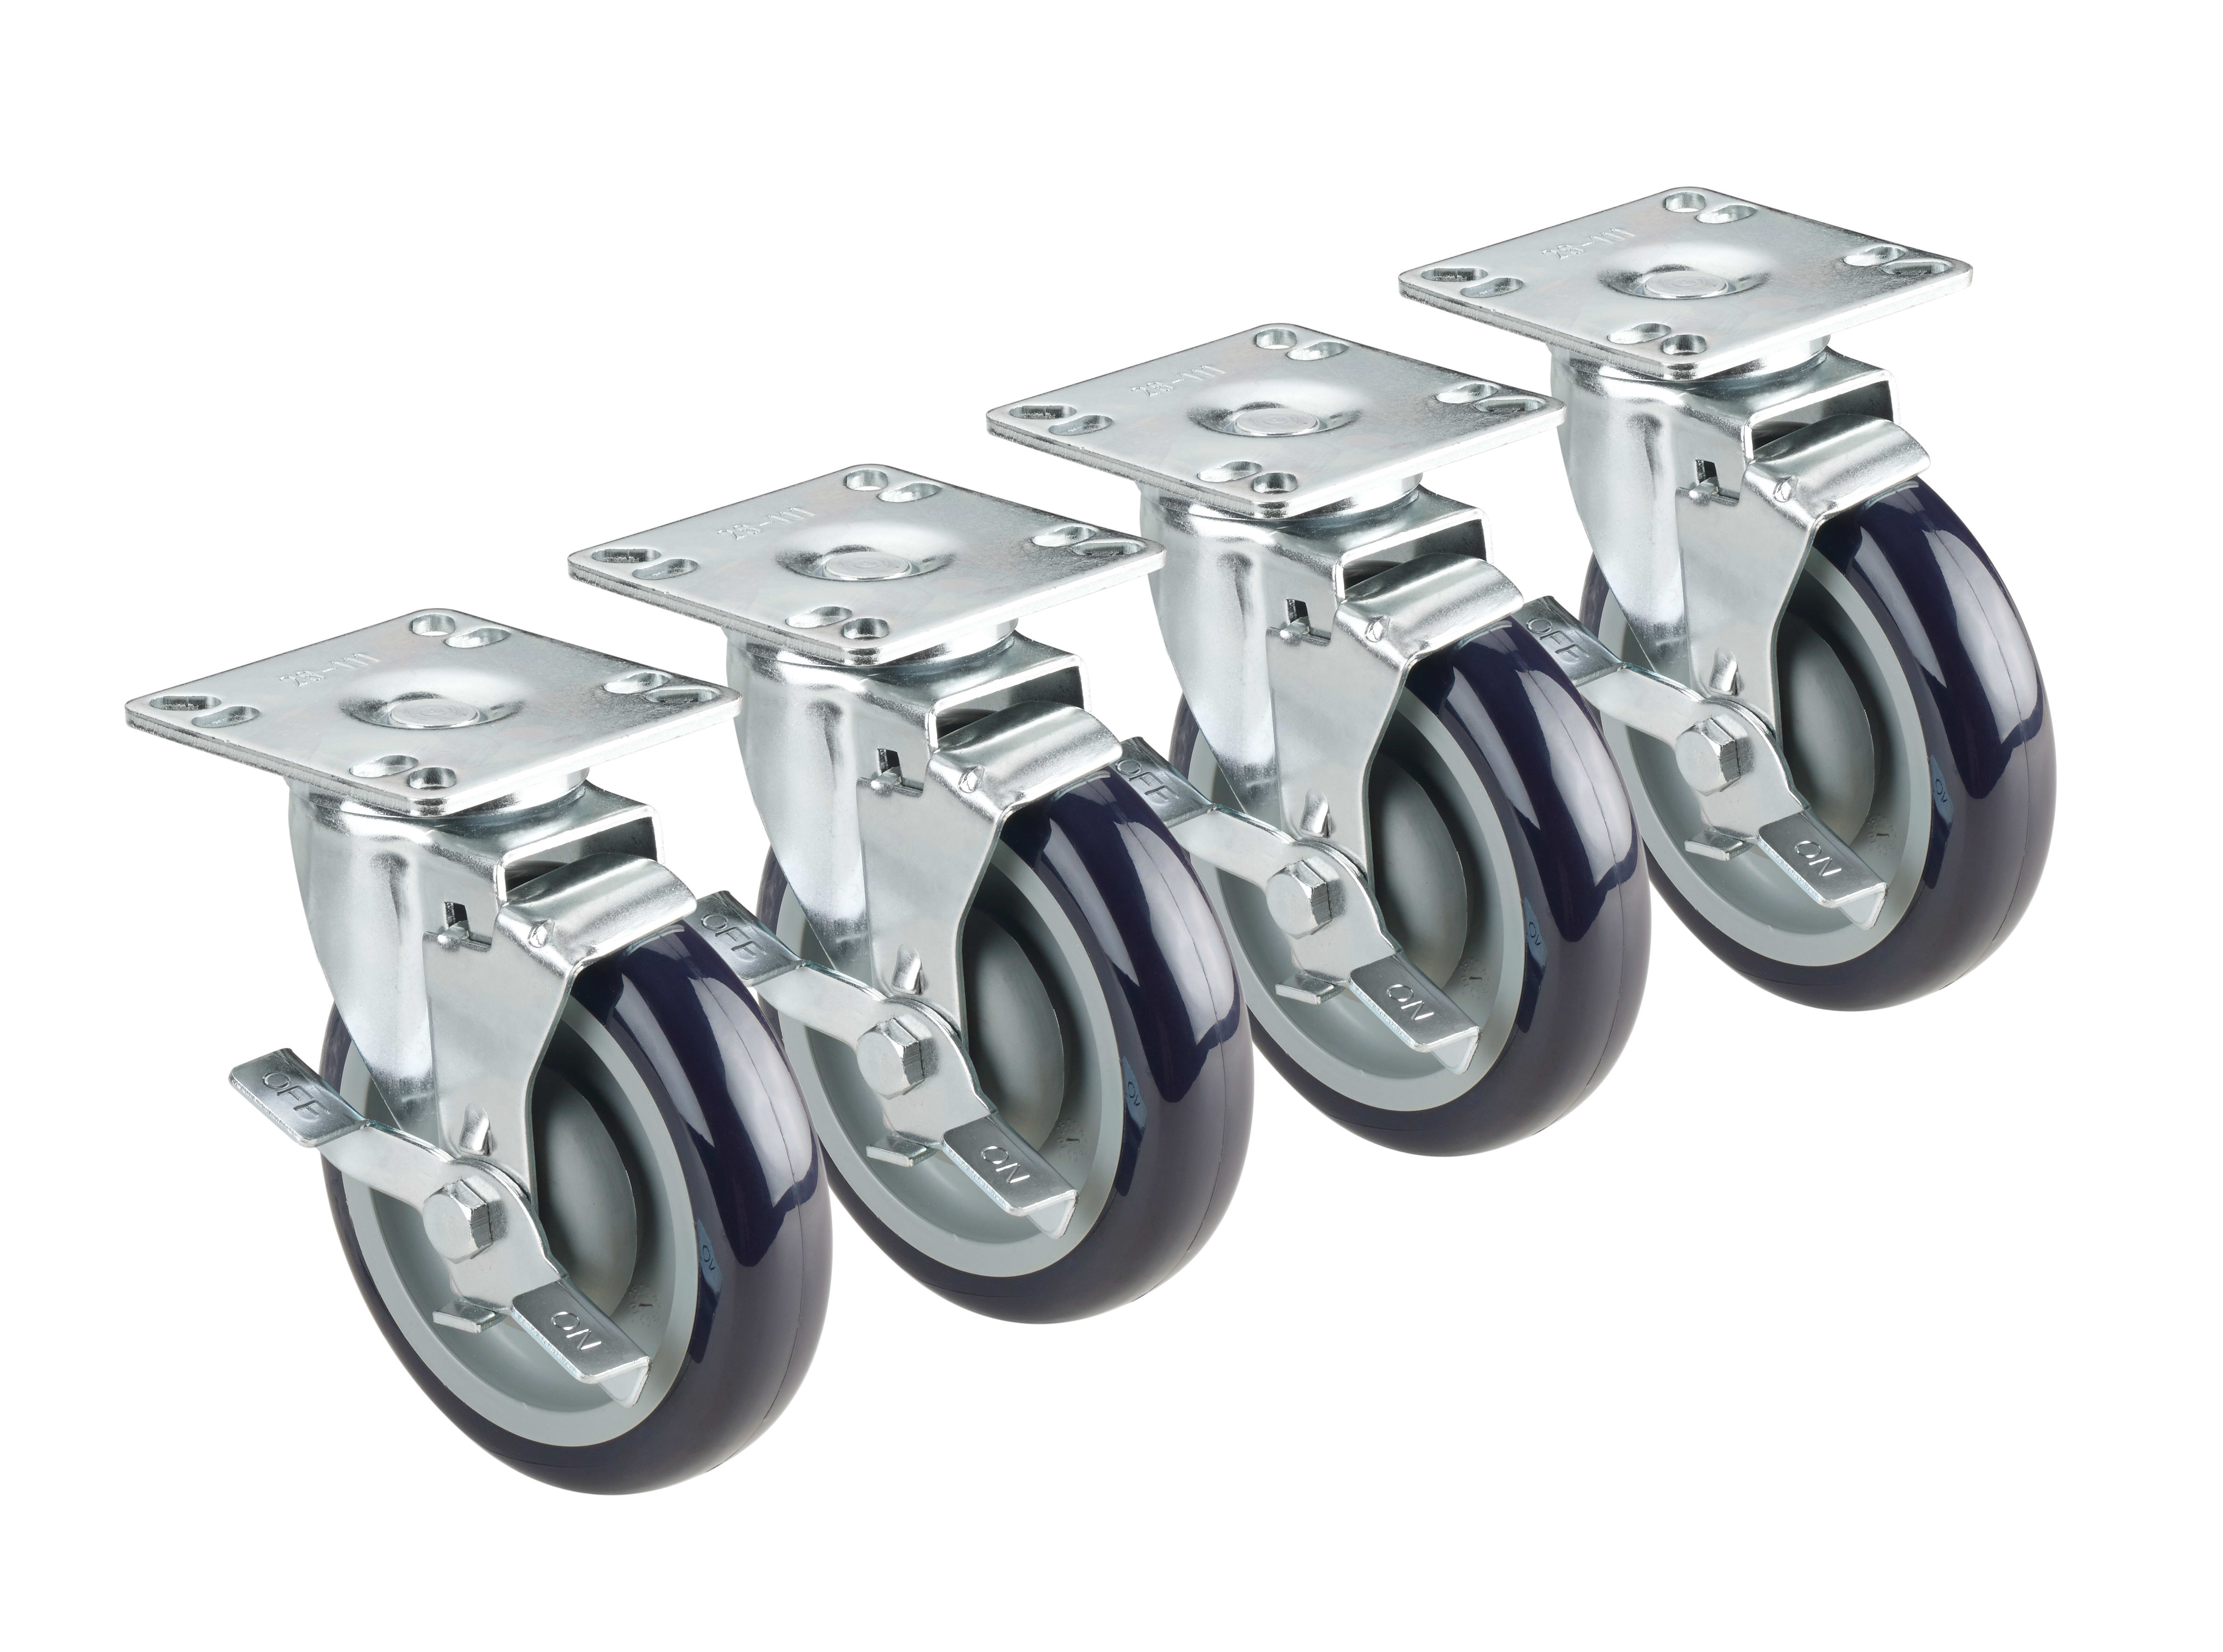 "Krowne 28-101S 4 Piece Universal Plate Caster Set w/ 3"" Wheel, 4 x 4"""